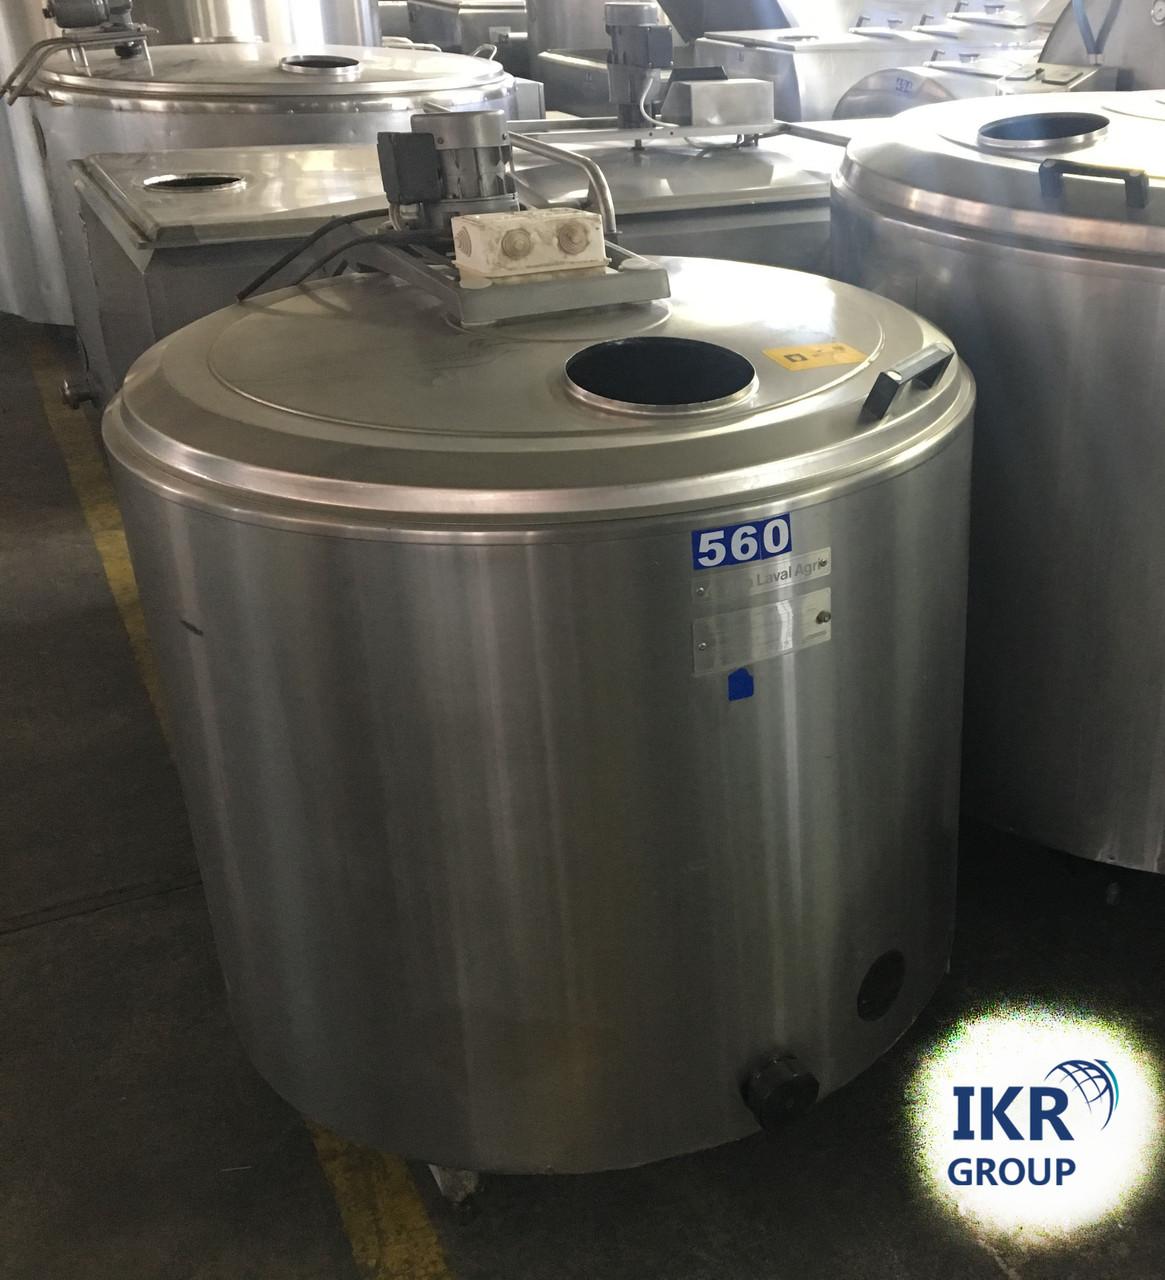 Охладитель молока Б/У ALFA LAVAL 400 открытого типа объёмом 400 литров